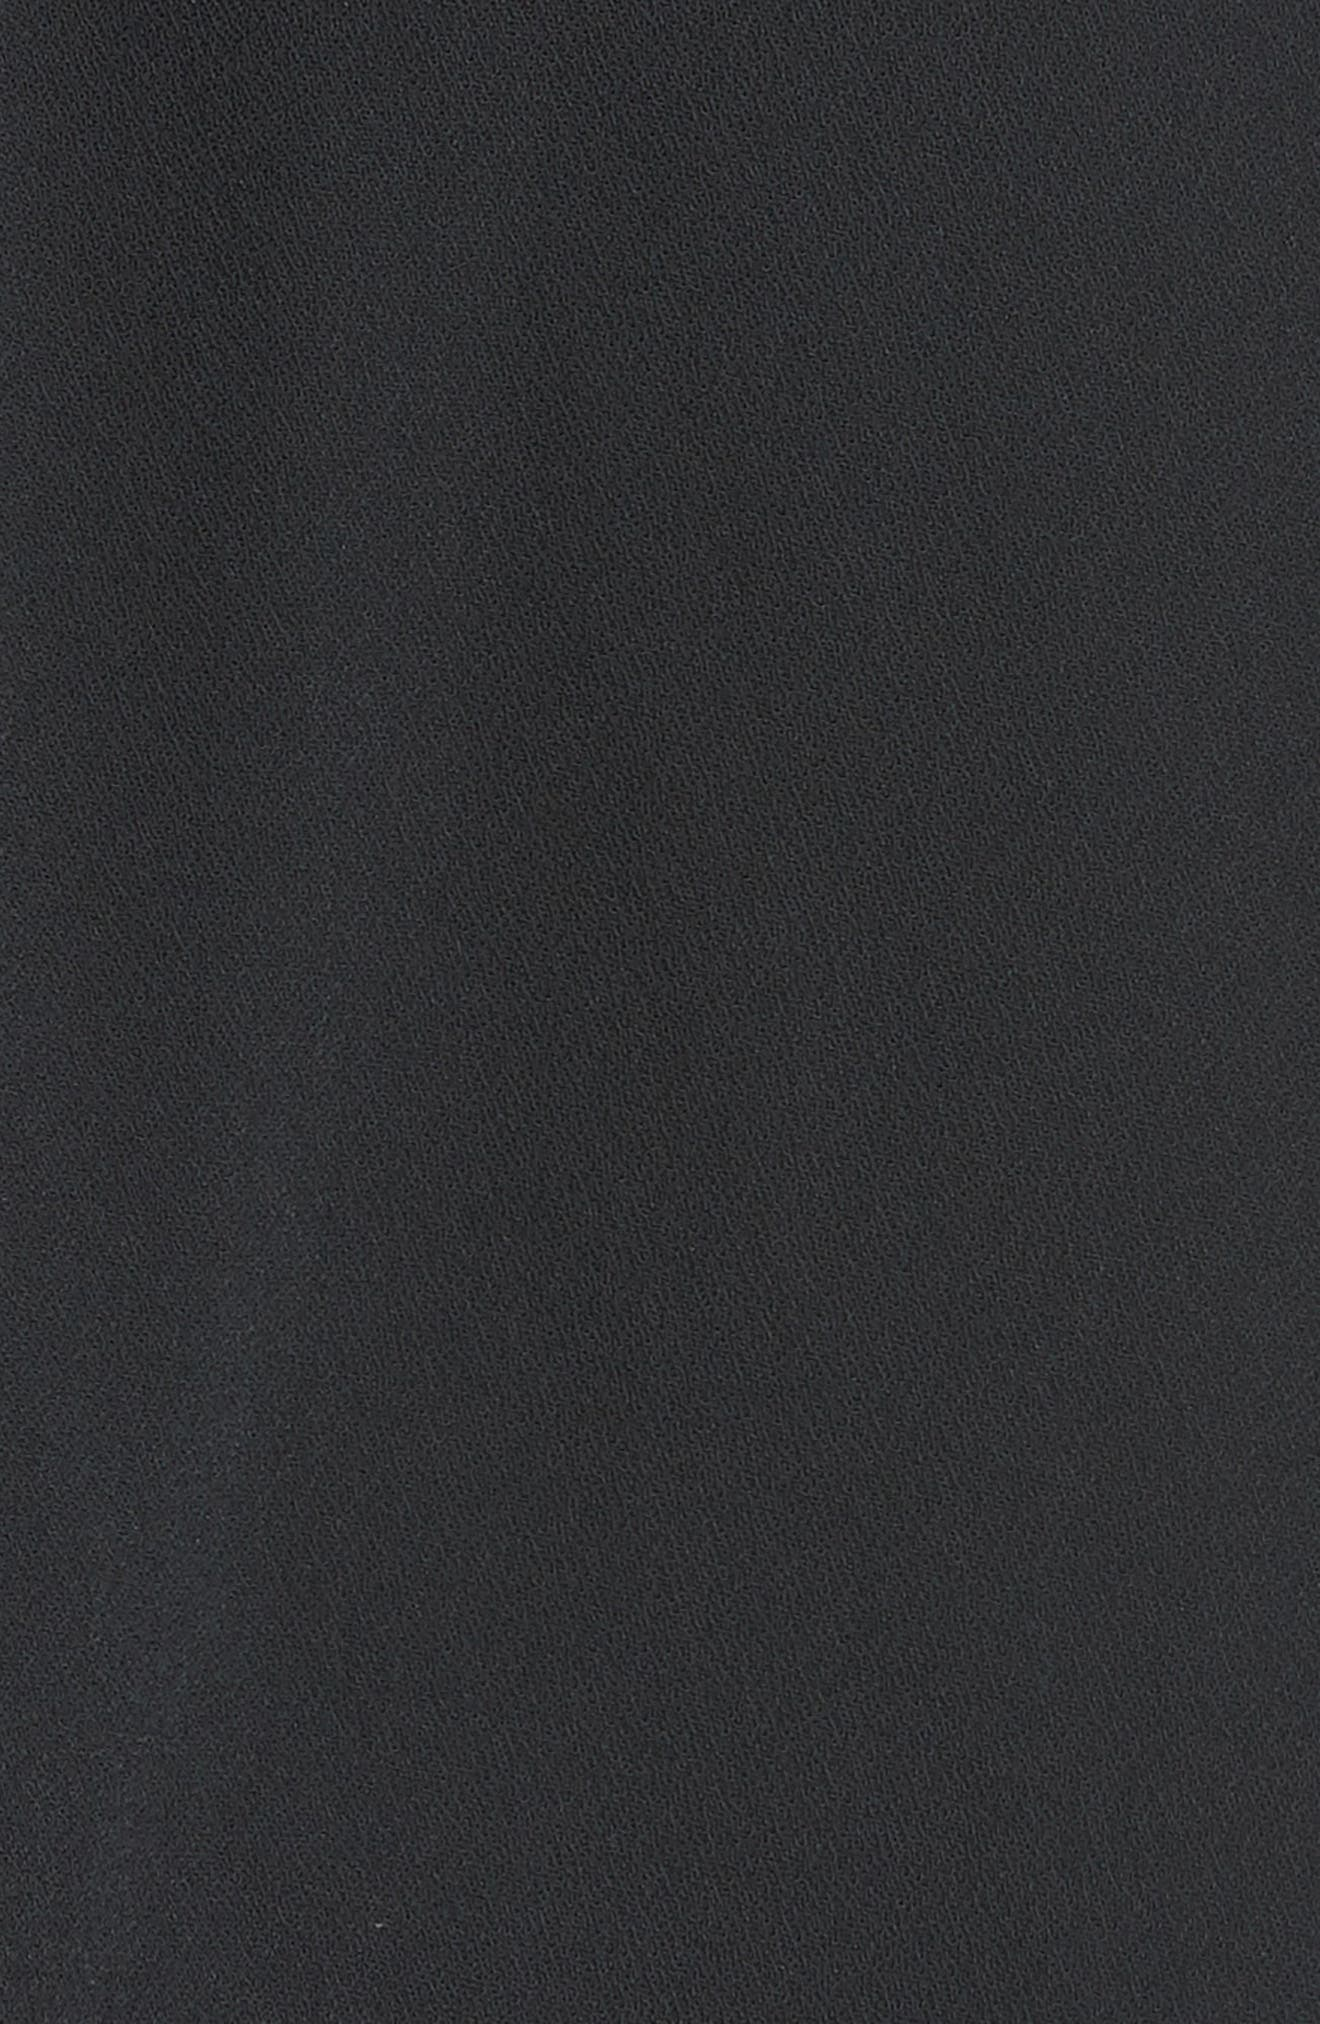 Structured Lace Cold Shoulder Midi Dress,                             Alternate thumbnail 5, color,                             001